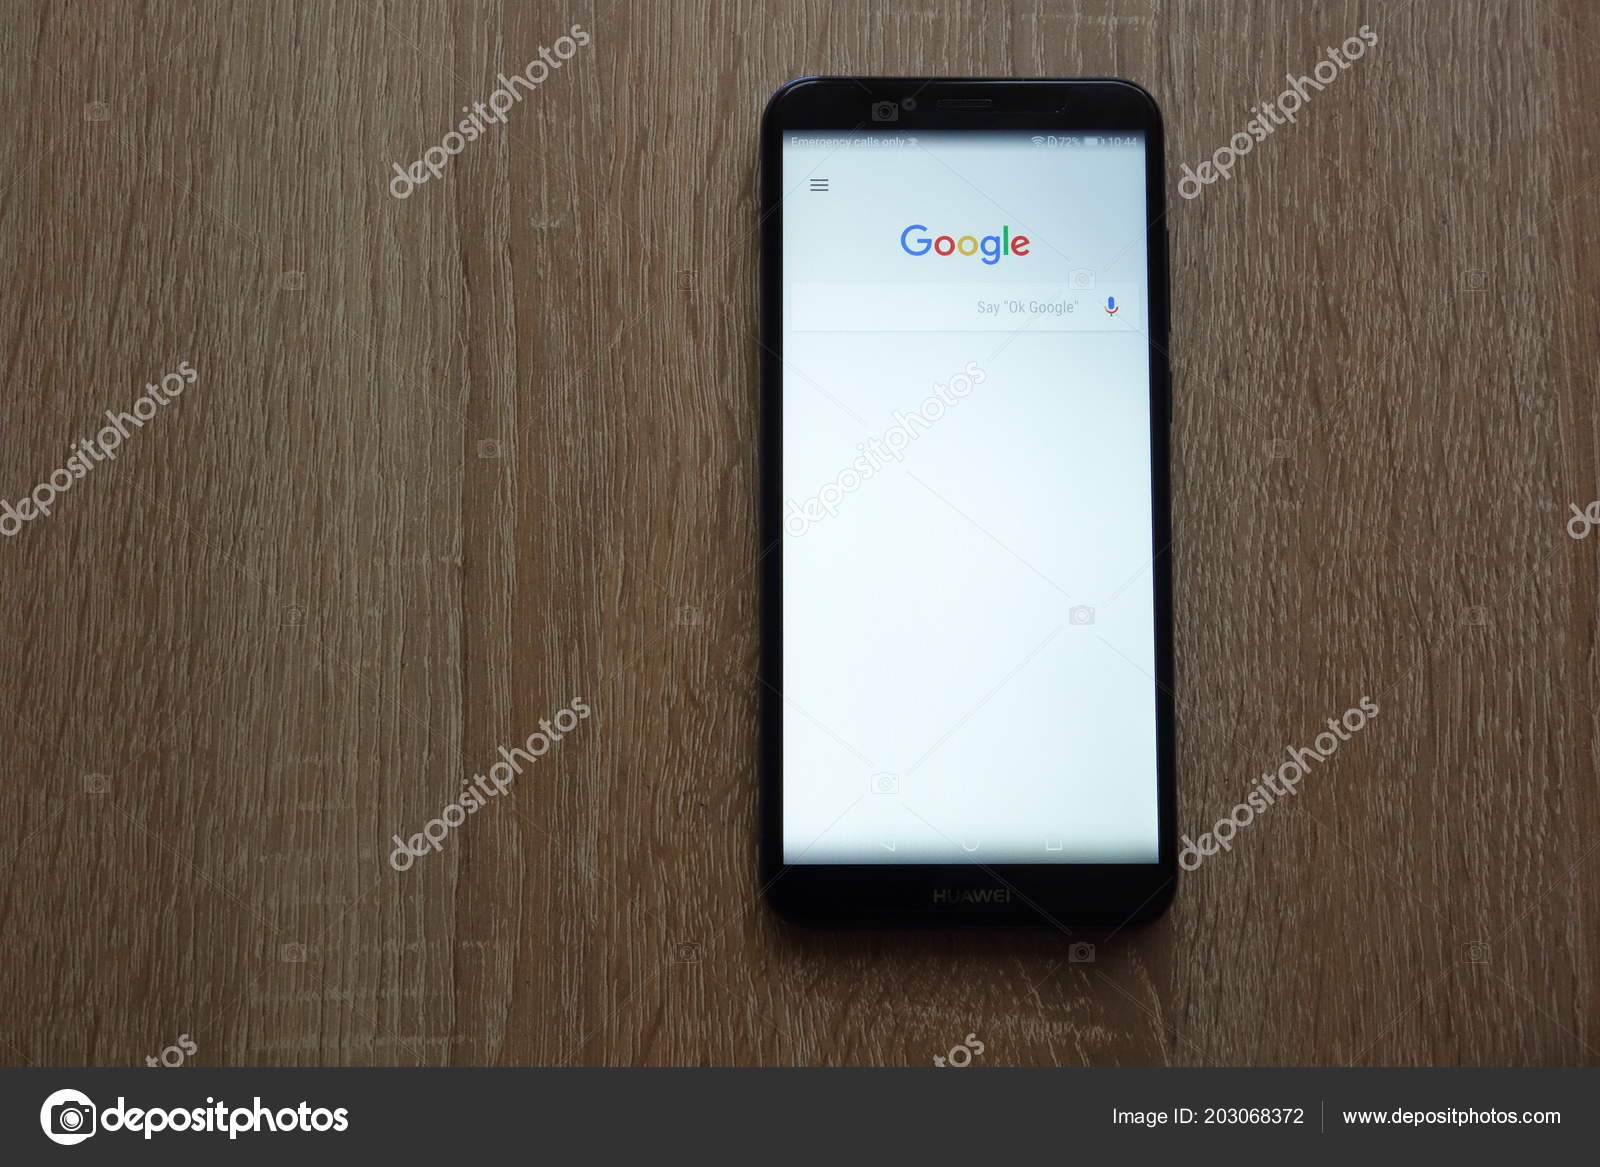 Konskie Poland June 2018 Google Browser Displayed New Huawei